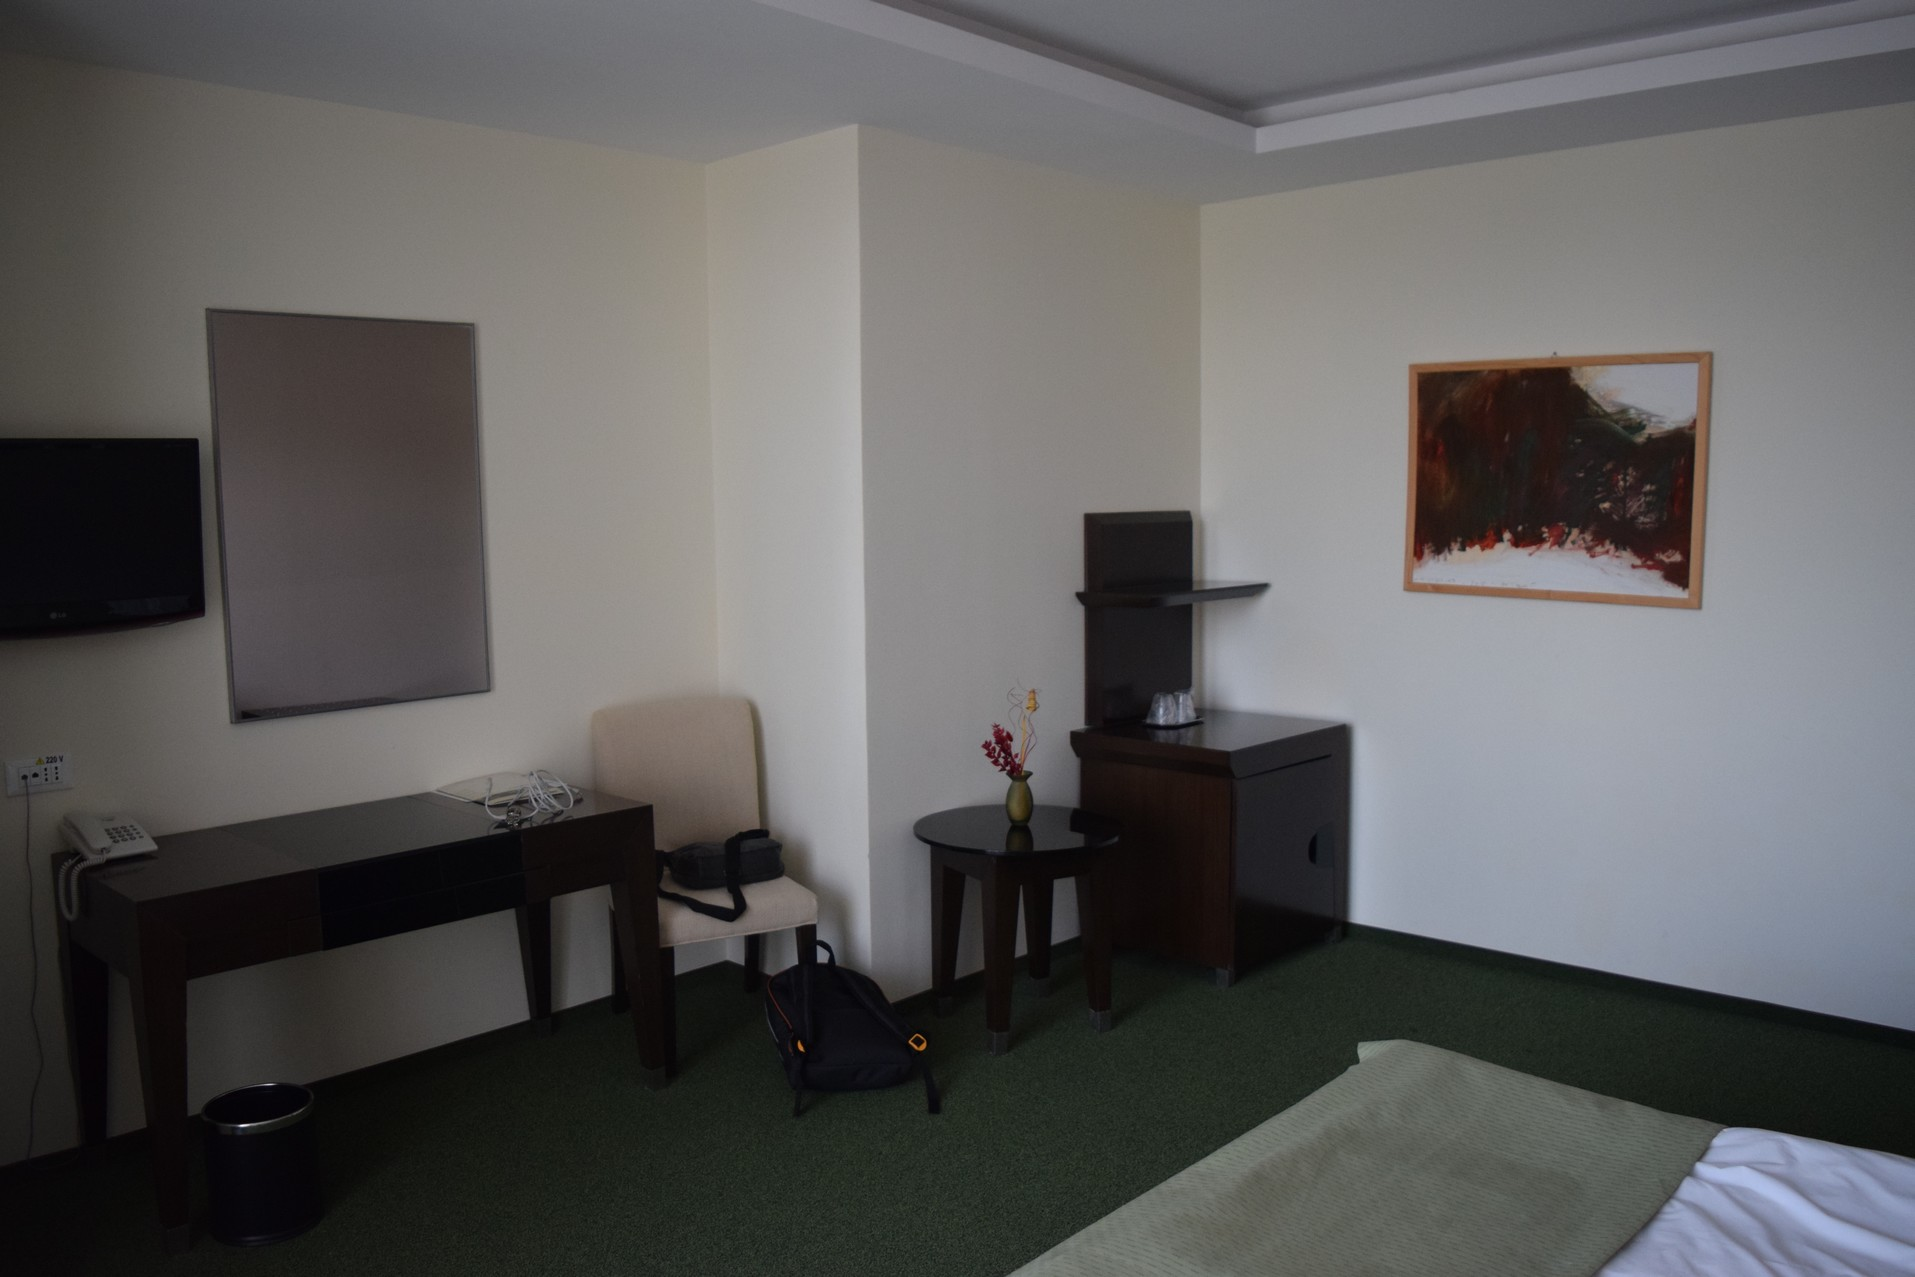 Balvanyos hotel room